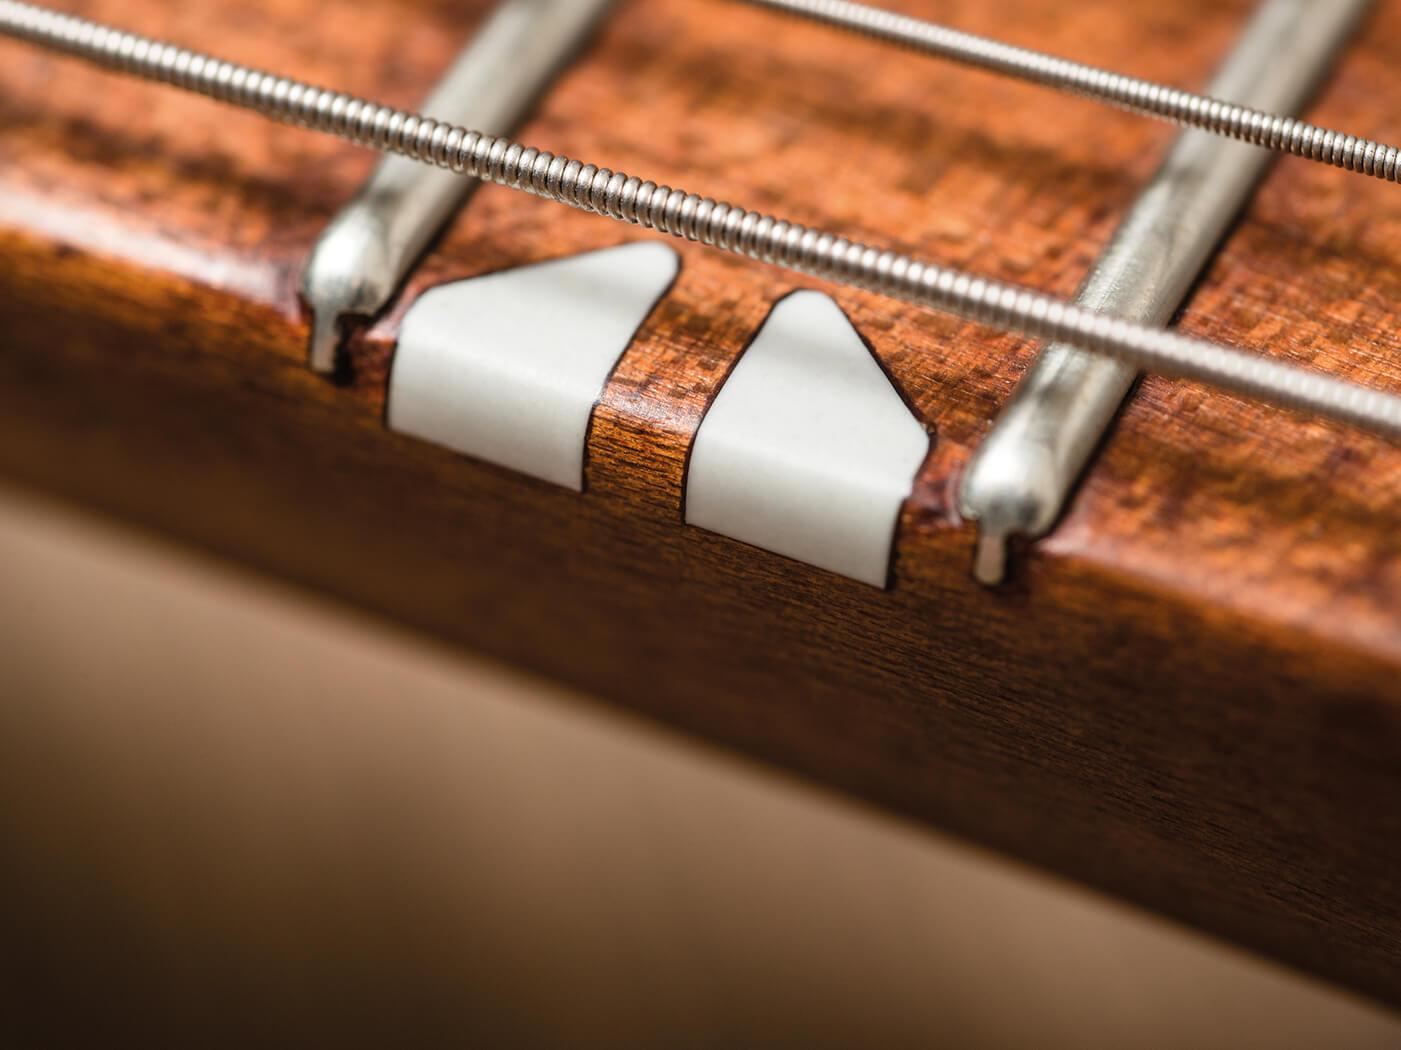 Fidelity Guitars Stellarosa inlays